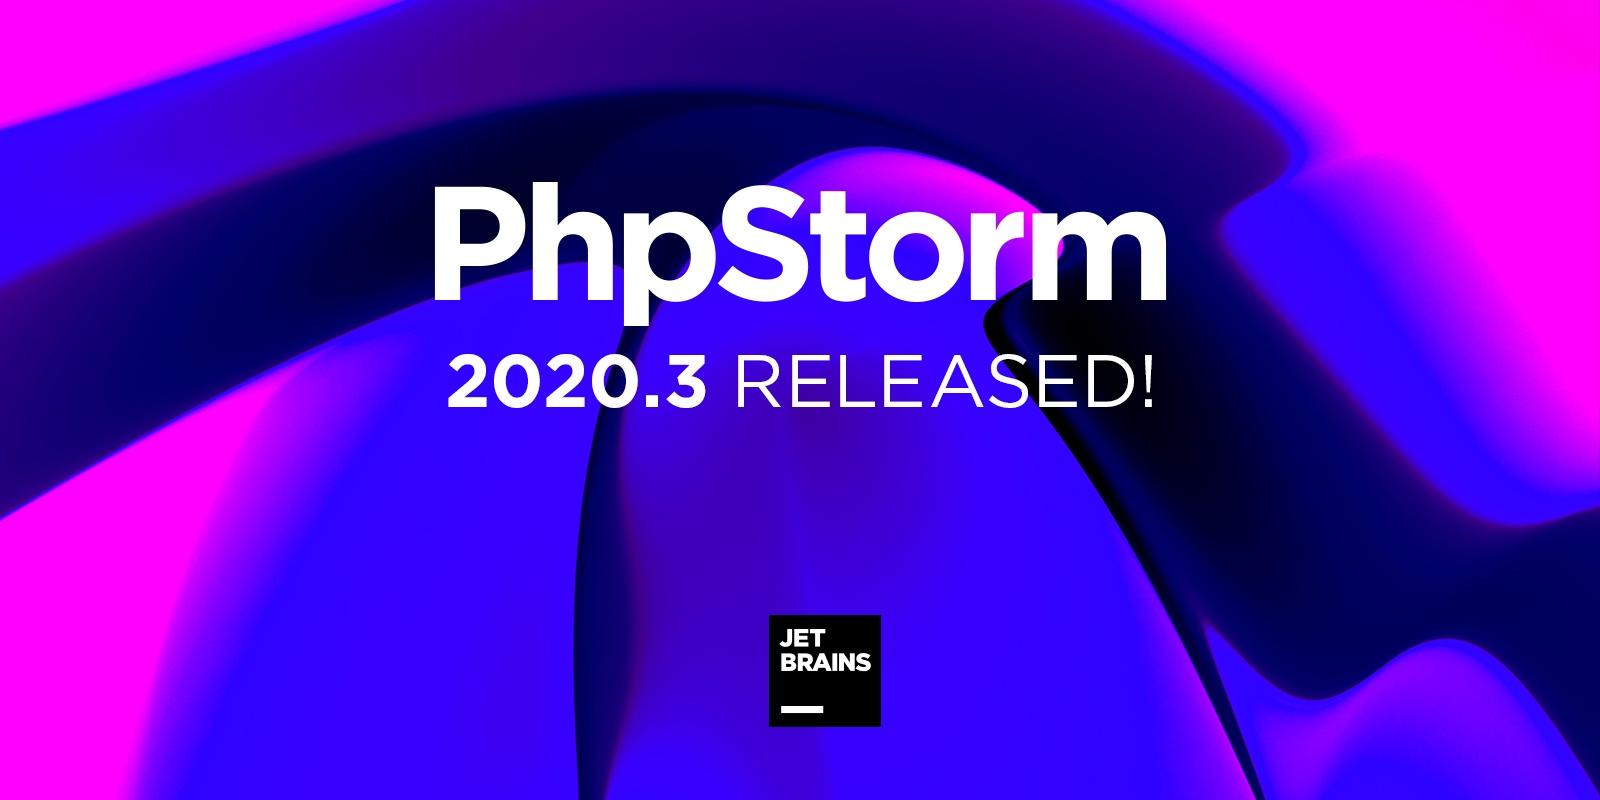 PhpStorm 2020.3 PHP 8, атрибуты, PHPStan и Psalm, Xdebug 3, Tailwind CSS и совместная разработка